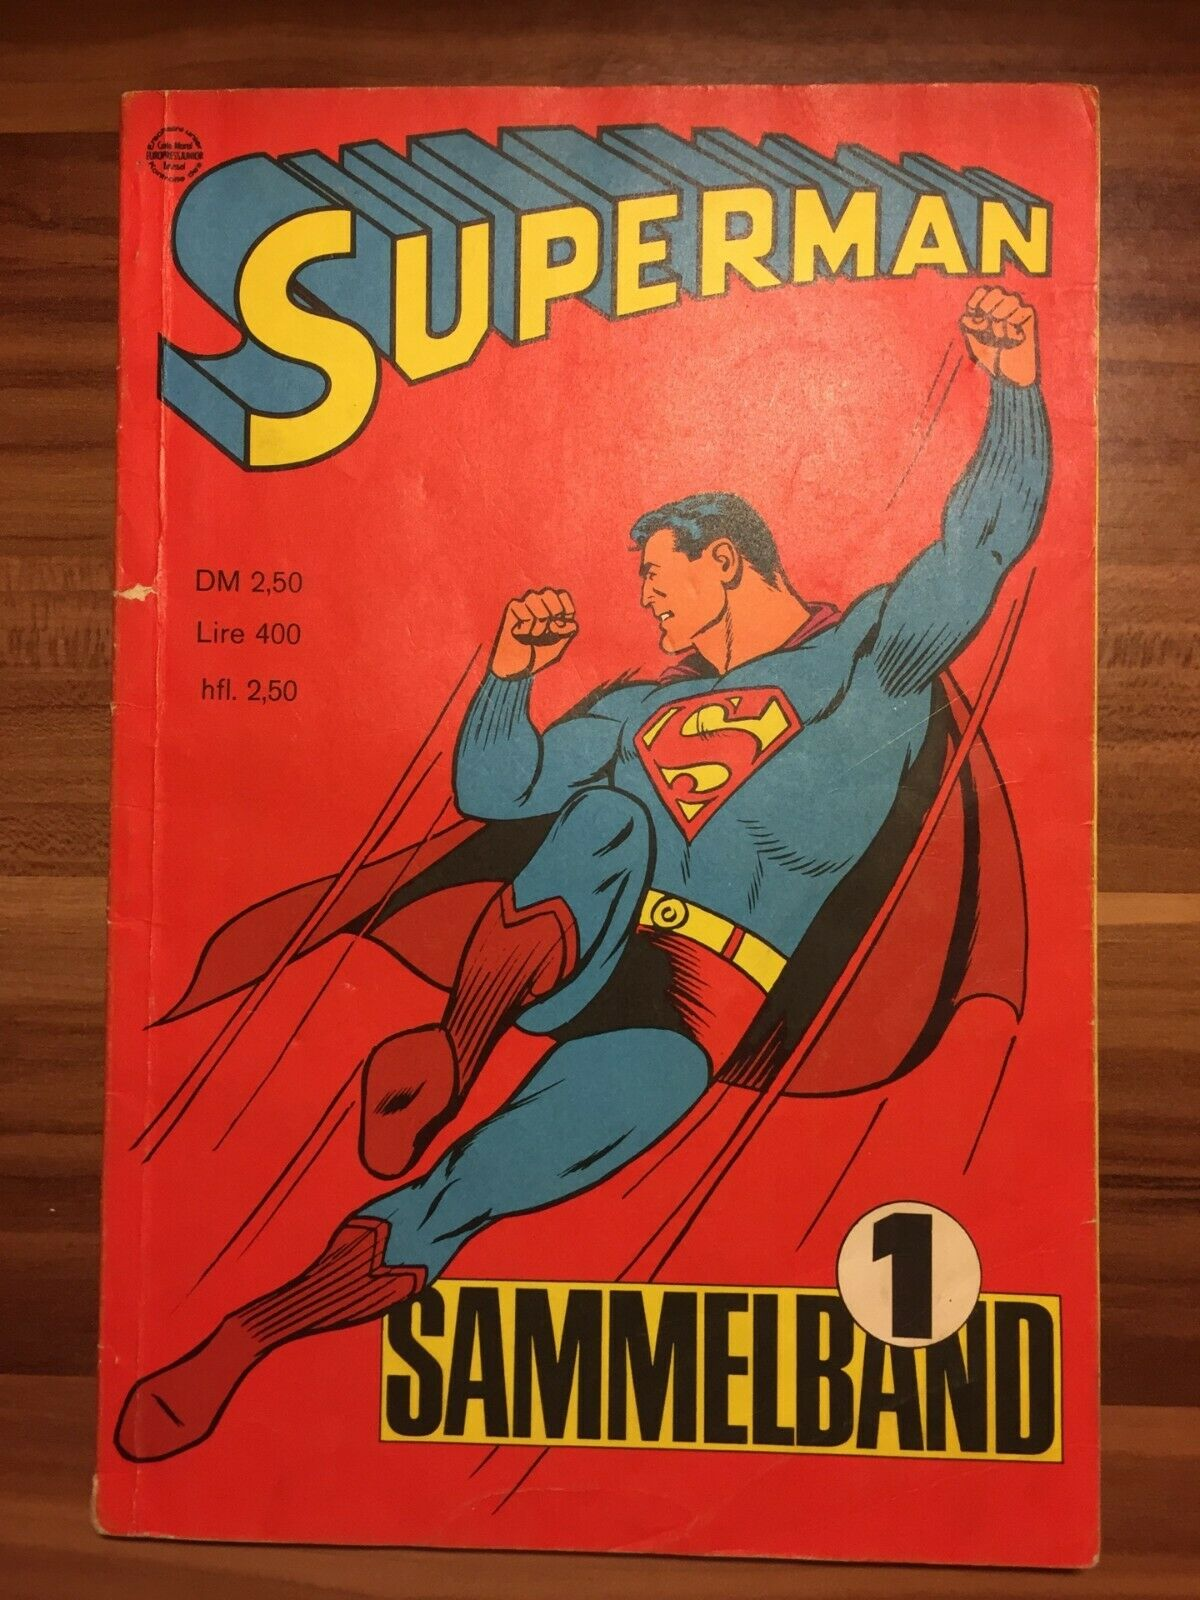 Superman Batman Ehapa Heft 1-4 1966 in Sammelband TOP Zustand 1, Umschlag Z 1-2